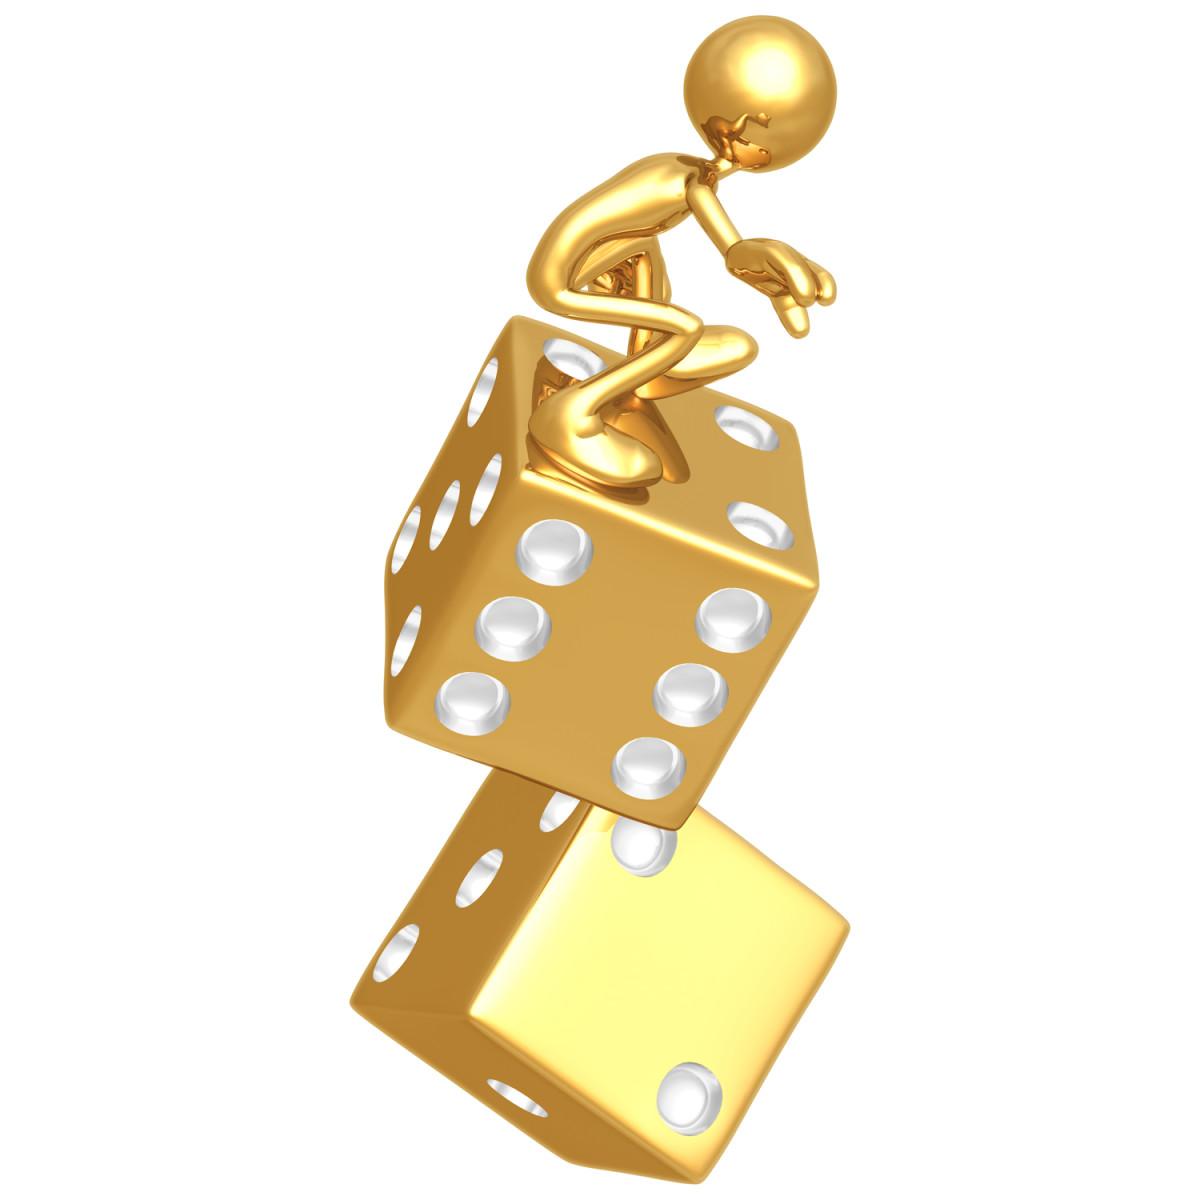 Balancing risk and reward isn't easy!